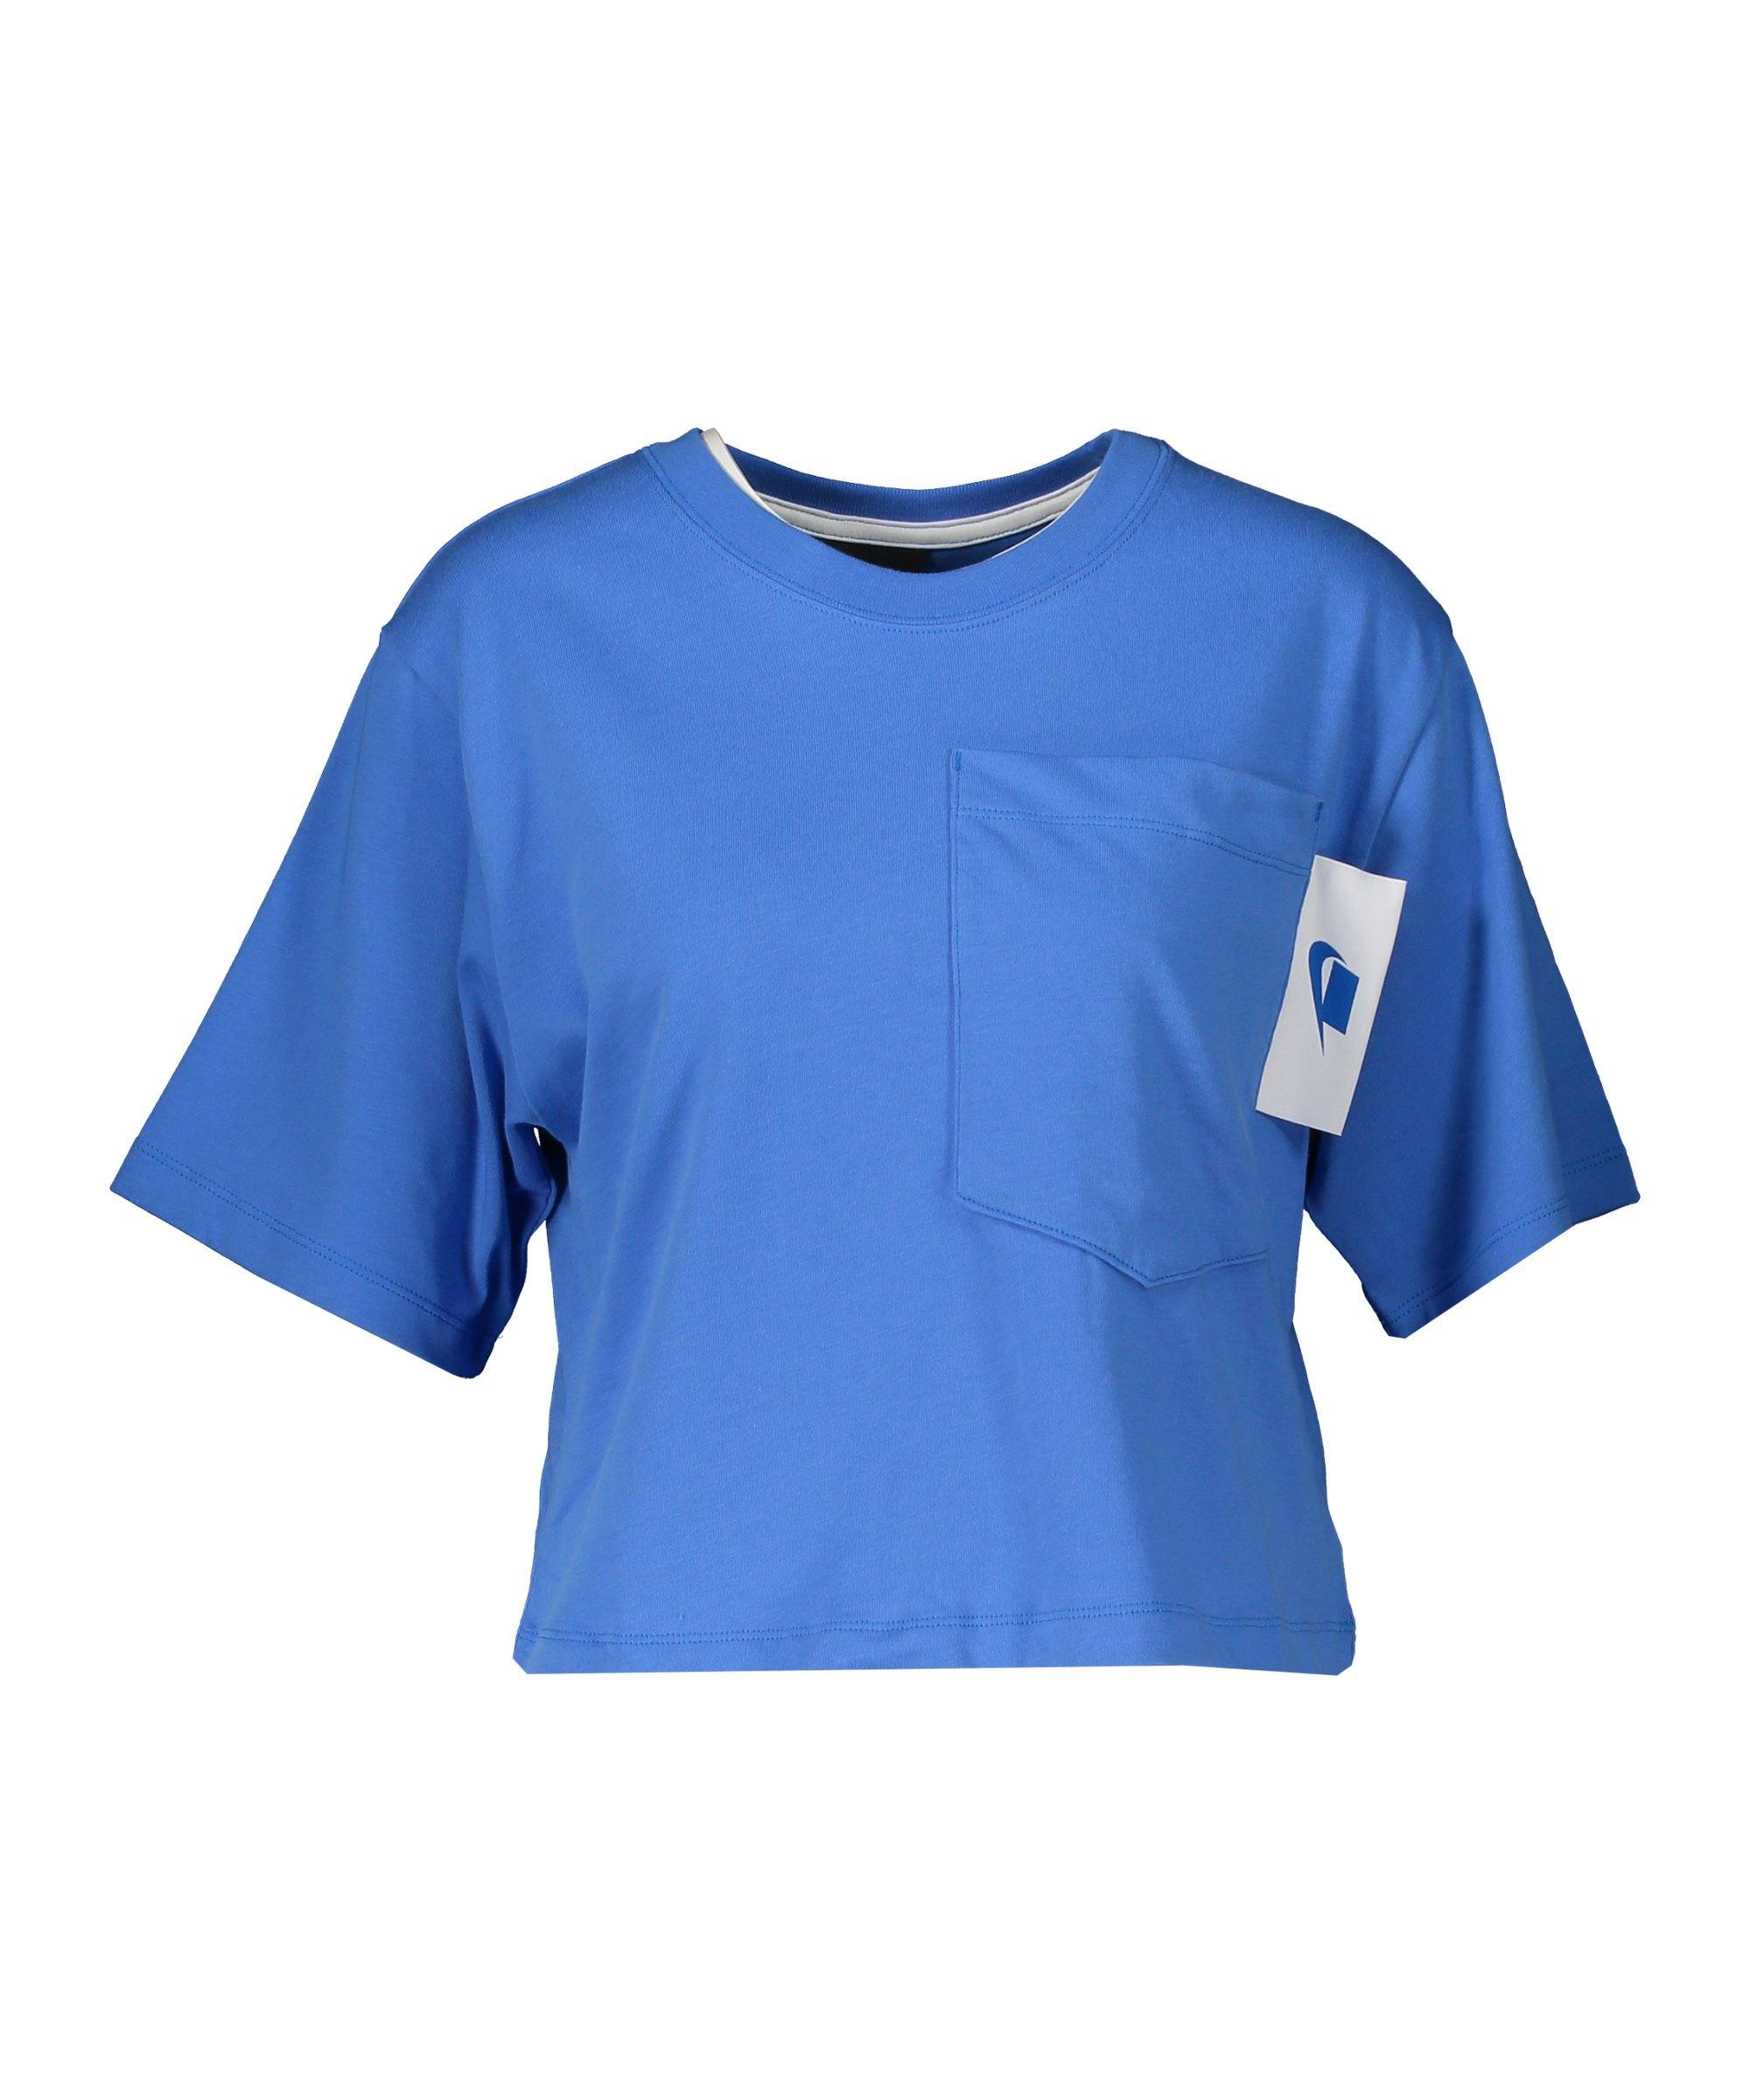 Nike Crop T-Shirt Damen Blau F402 - blau